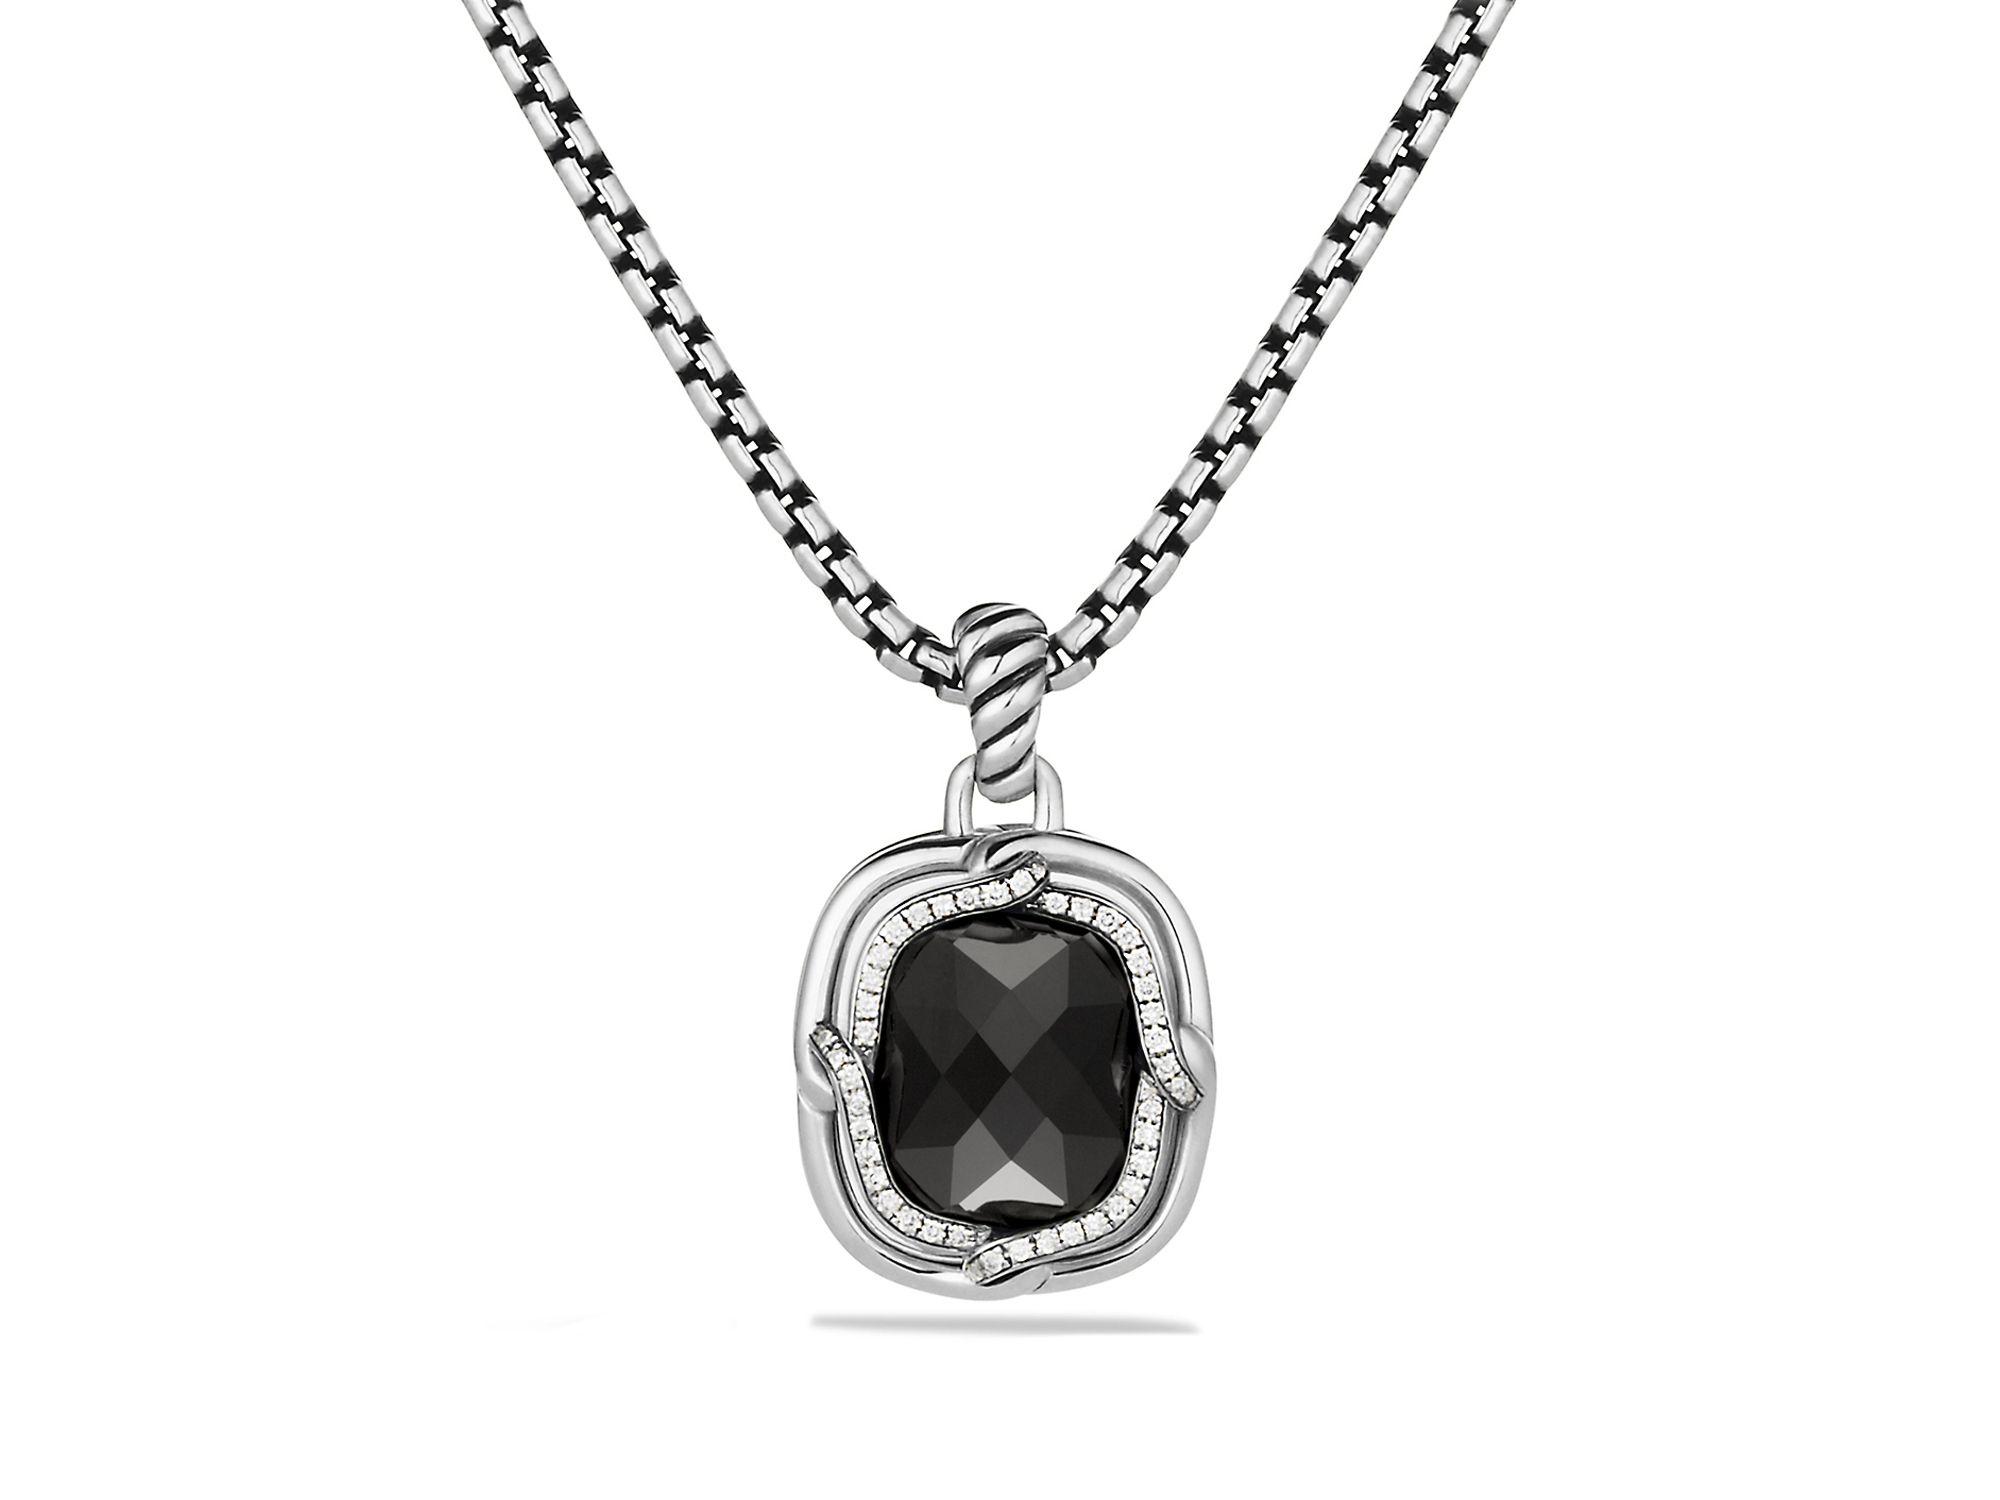 Lyst david yurman labyrinth small pendant with black onyx in black gallery aloadofball Gallery